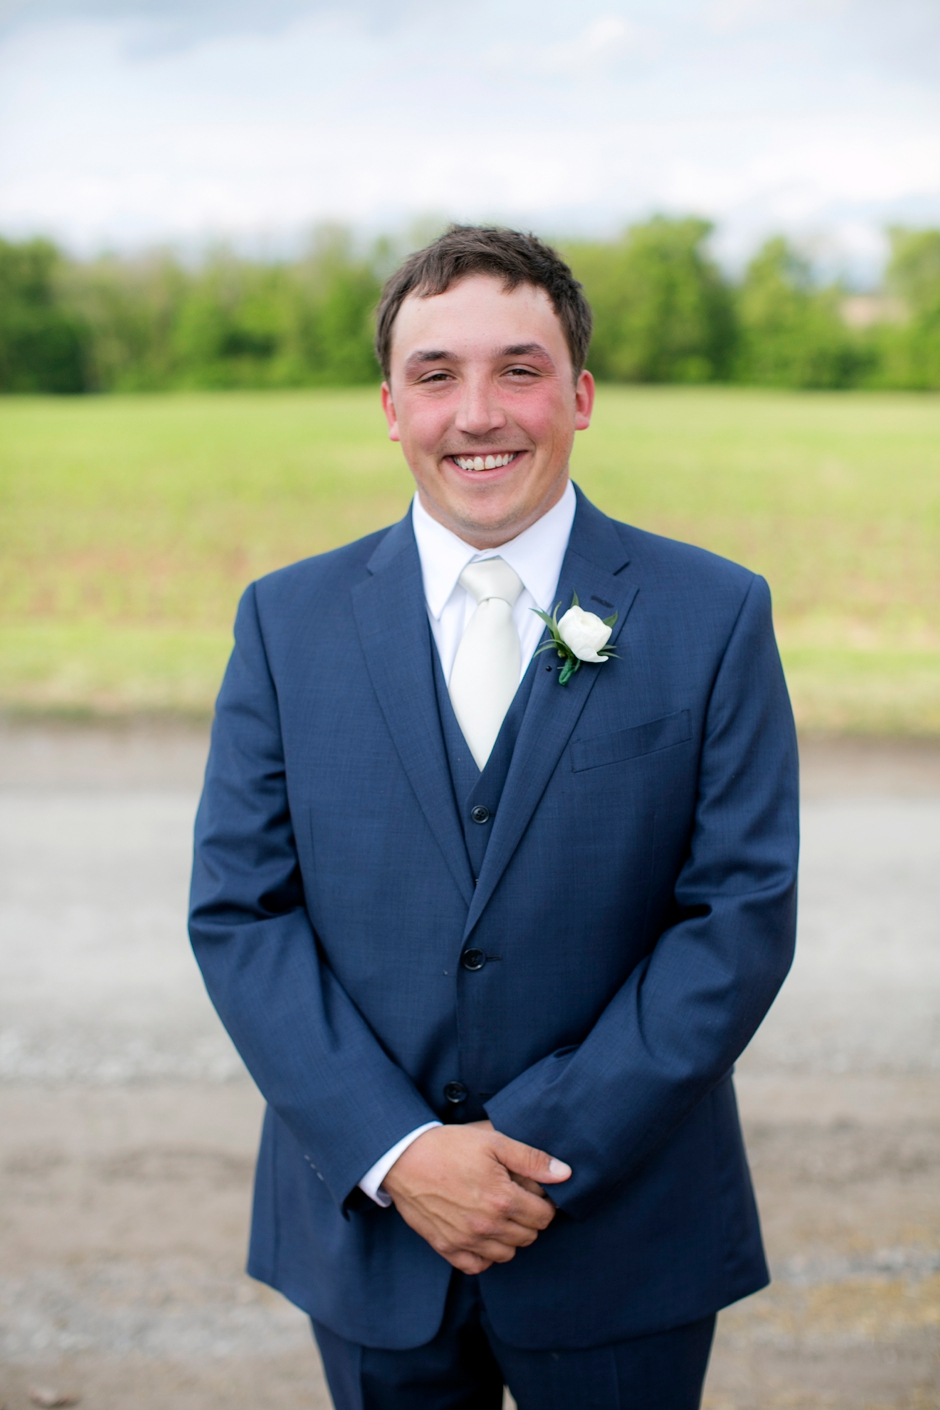 langley-farm-bourbon-wedding-spring-cream-bride-woodford-709